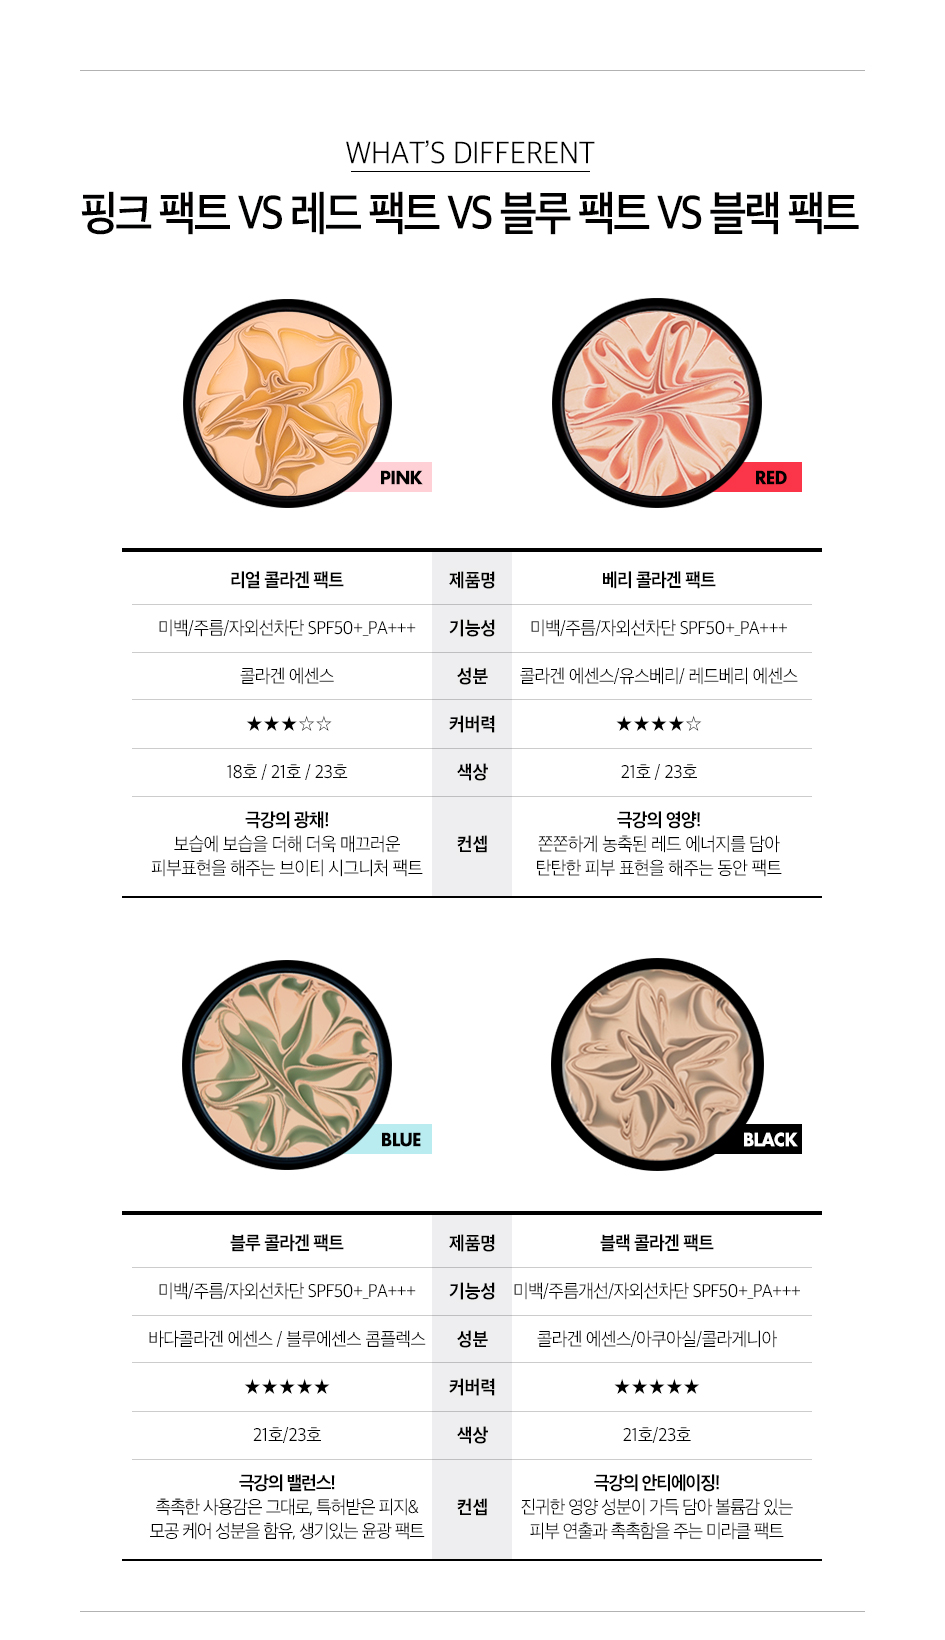 Công dụng Phấn nền VT Berry Collagen Pact